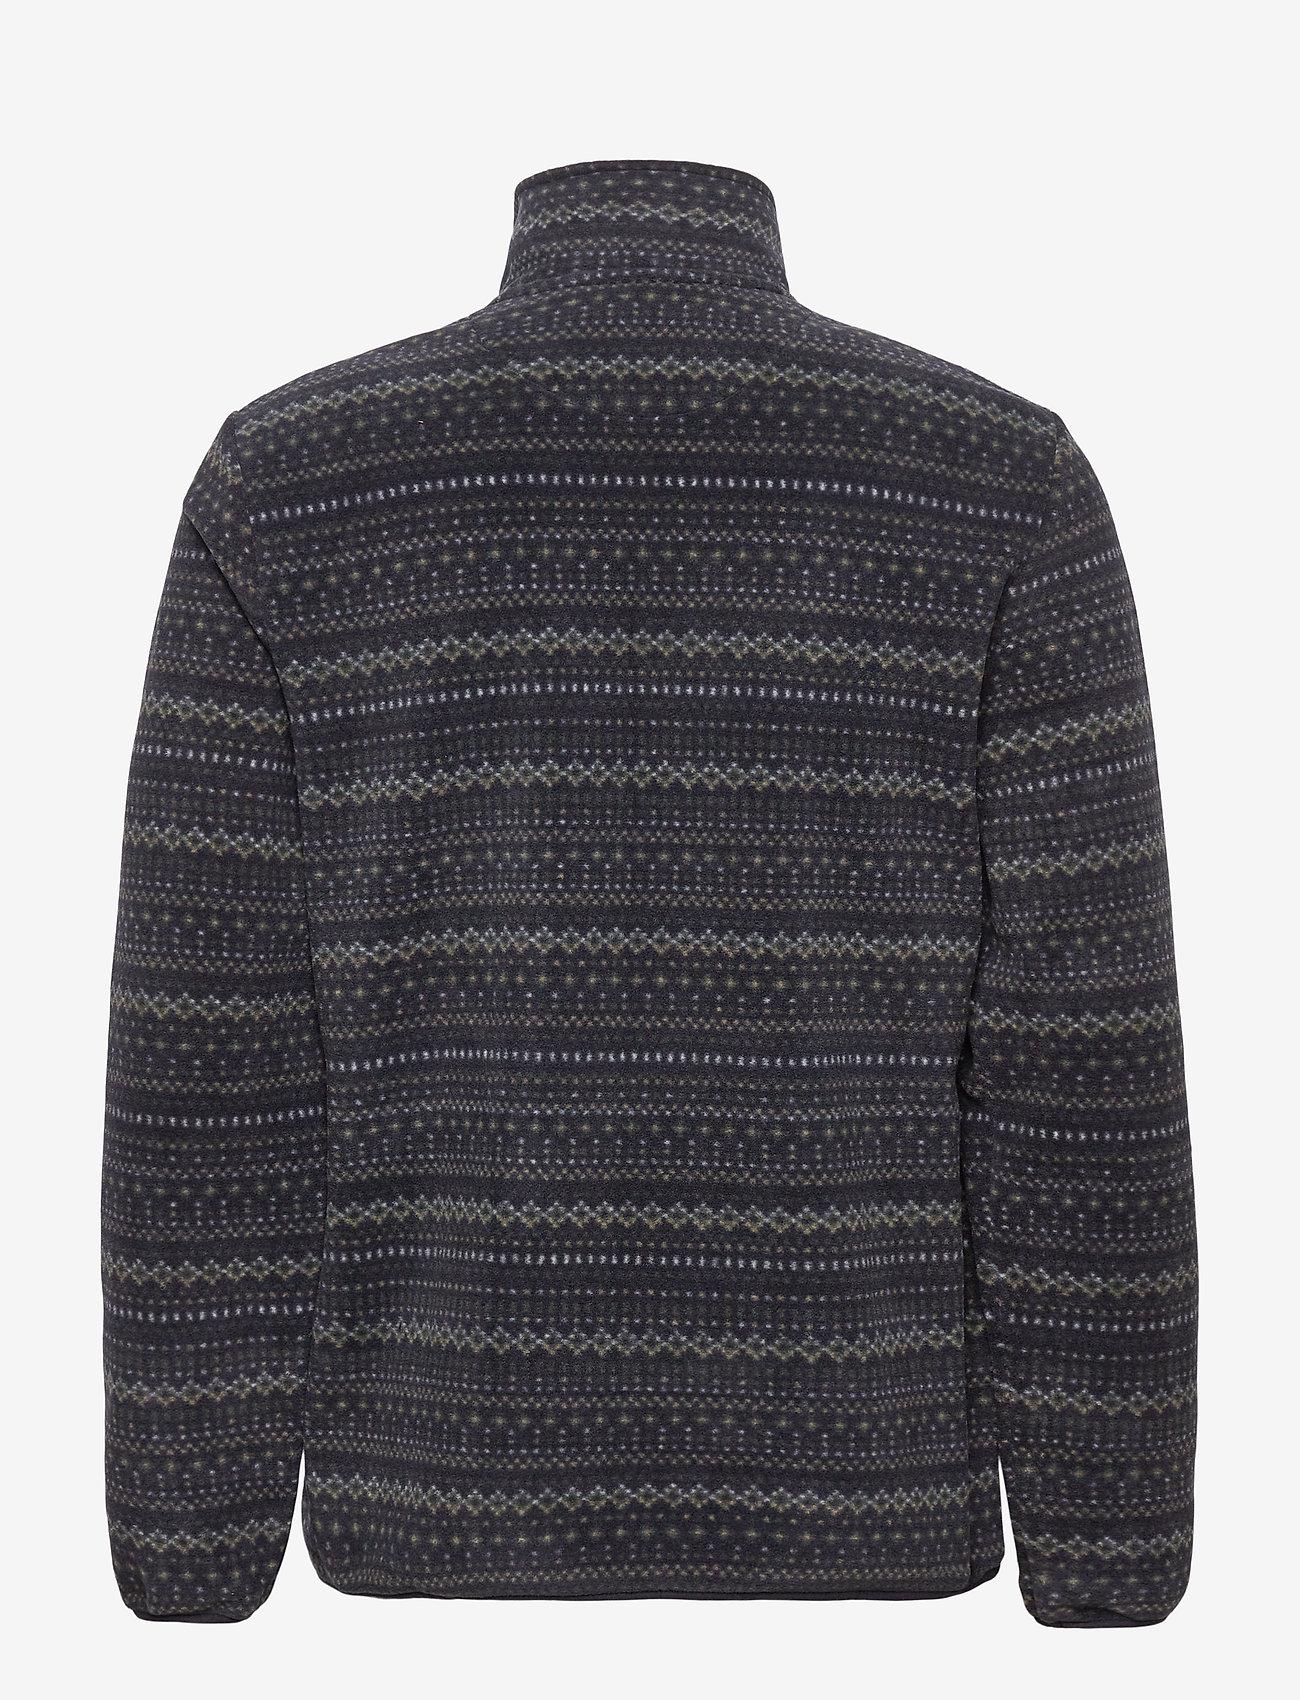 Lyle & Scott - Fairisle Fleece Half Zip - mid layer jackets - z865 jet black - 1